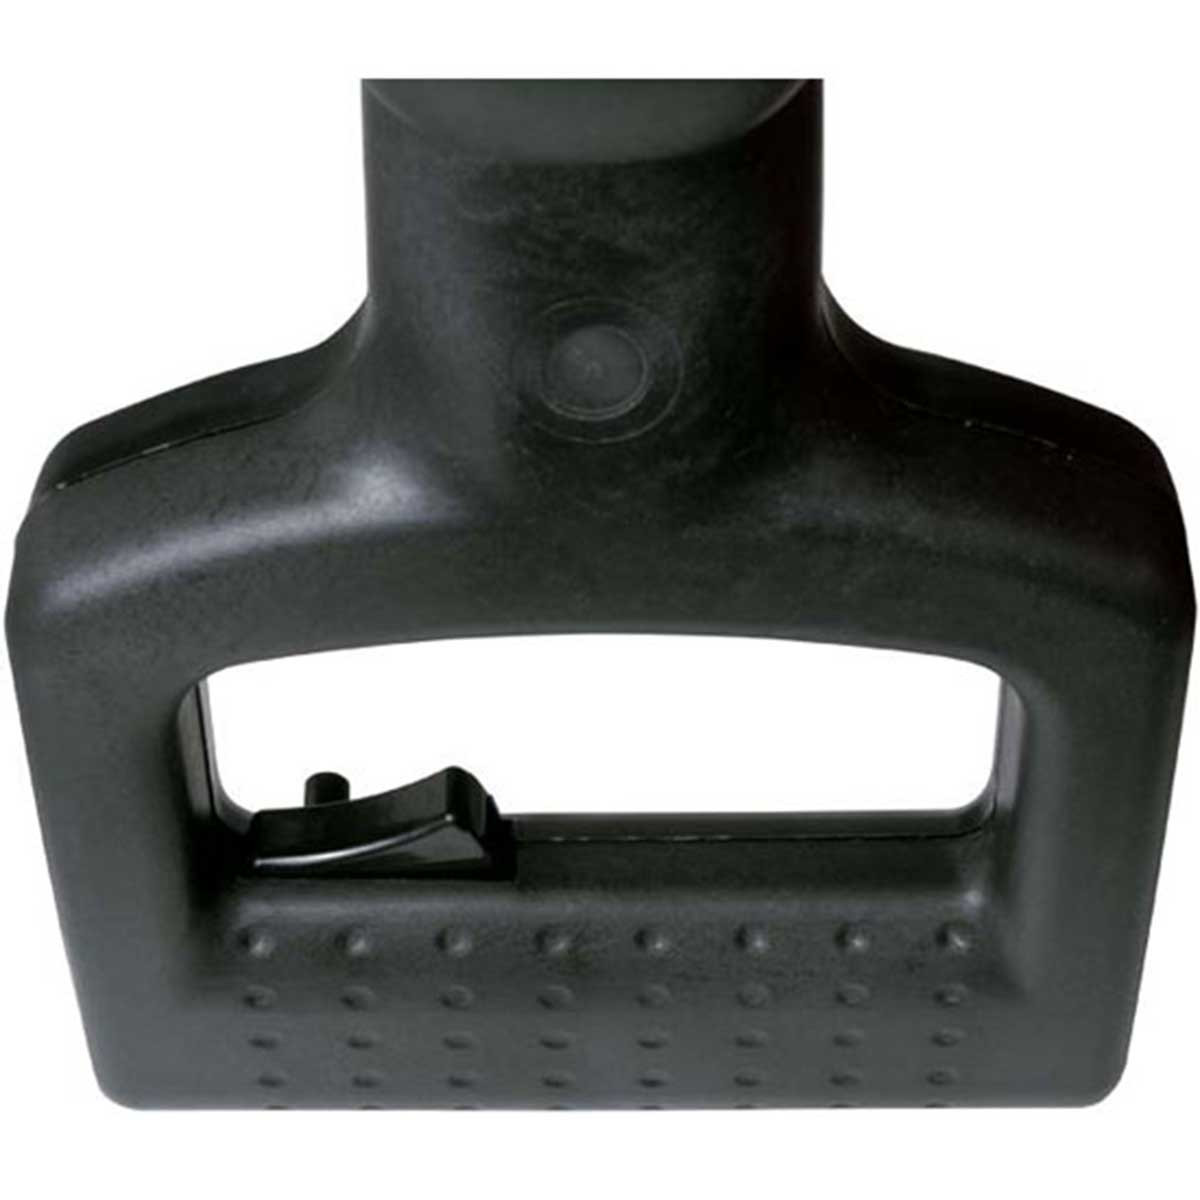 mk bx-3 brick saw easy grip handle